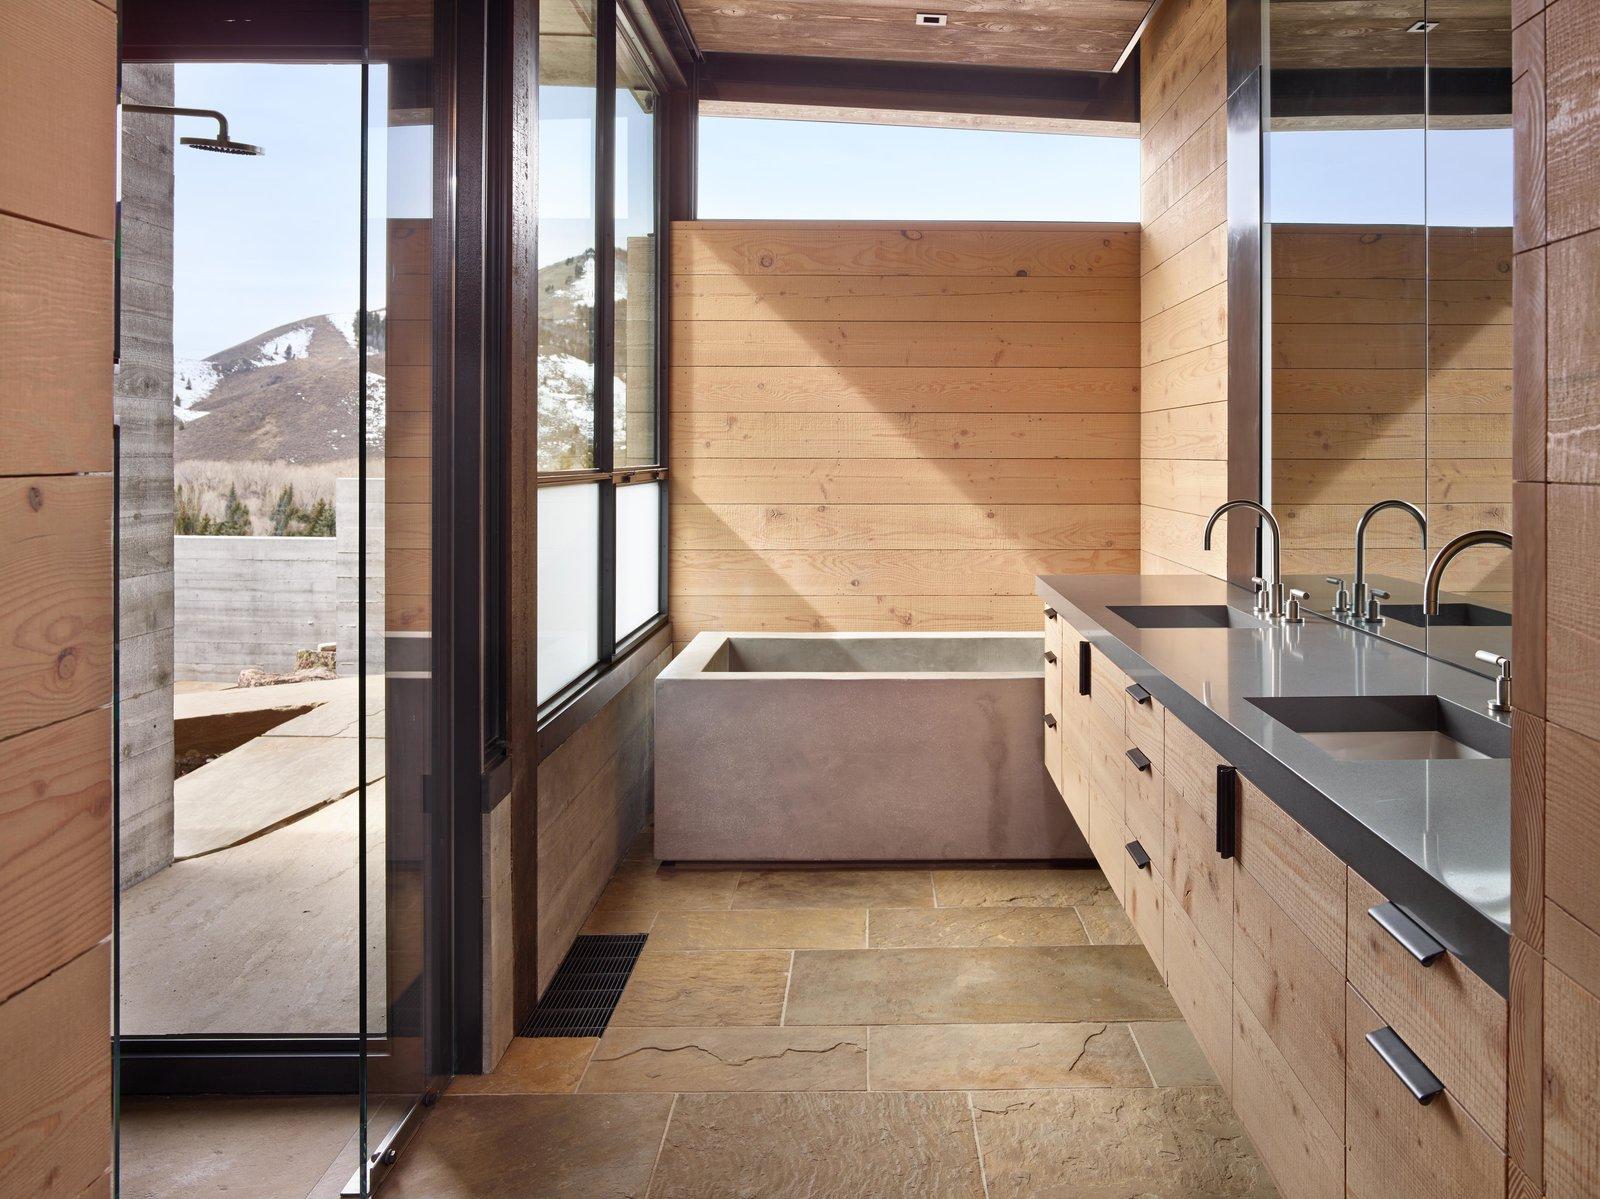 Bath Room, Recessed Lighting, Drop In Sink, Freestanding Tub, and Enclosed Shower Bigwood Residence | Olson Kundig  Photo 3 of 5 in Top 4 Homes of the Week With Spa-Like Bathrooms from Bigwood Residence